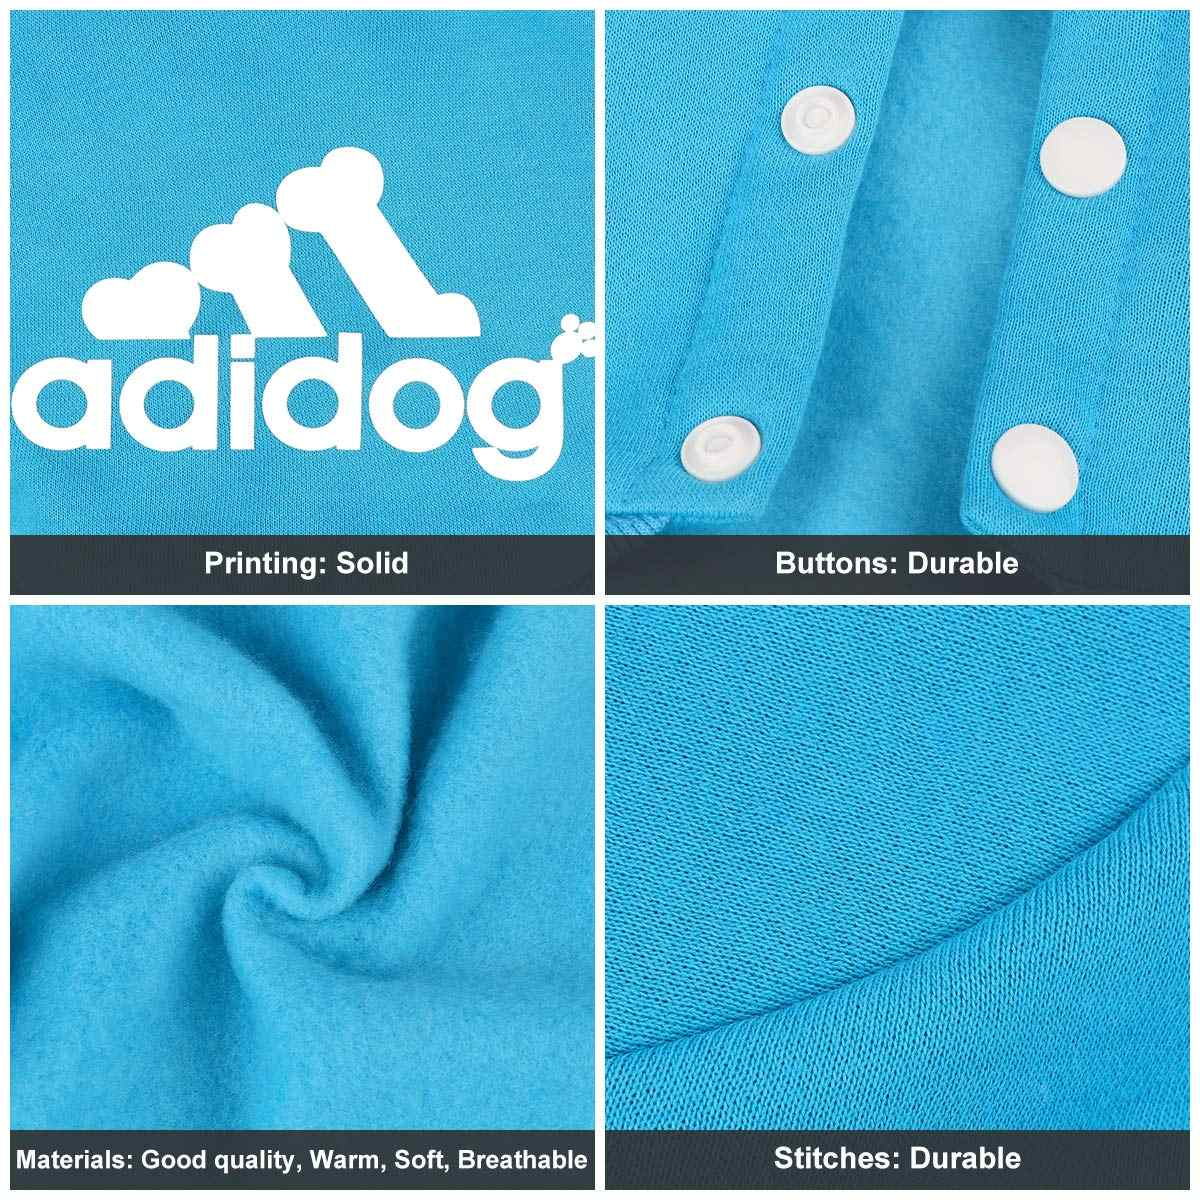 Pet Kleding Voor Hond Kat Puppy Hoodies Jas Winter Sweater Warme Trui Hond Outfits Hond Jas Huisdier Vier-Legged kleding